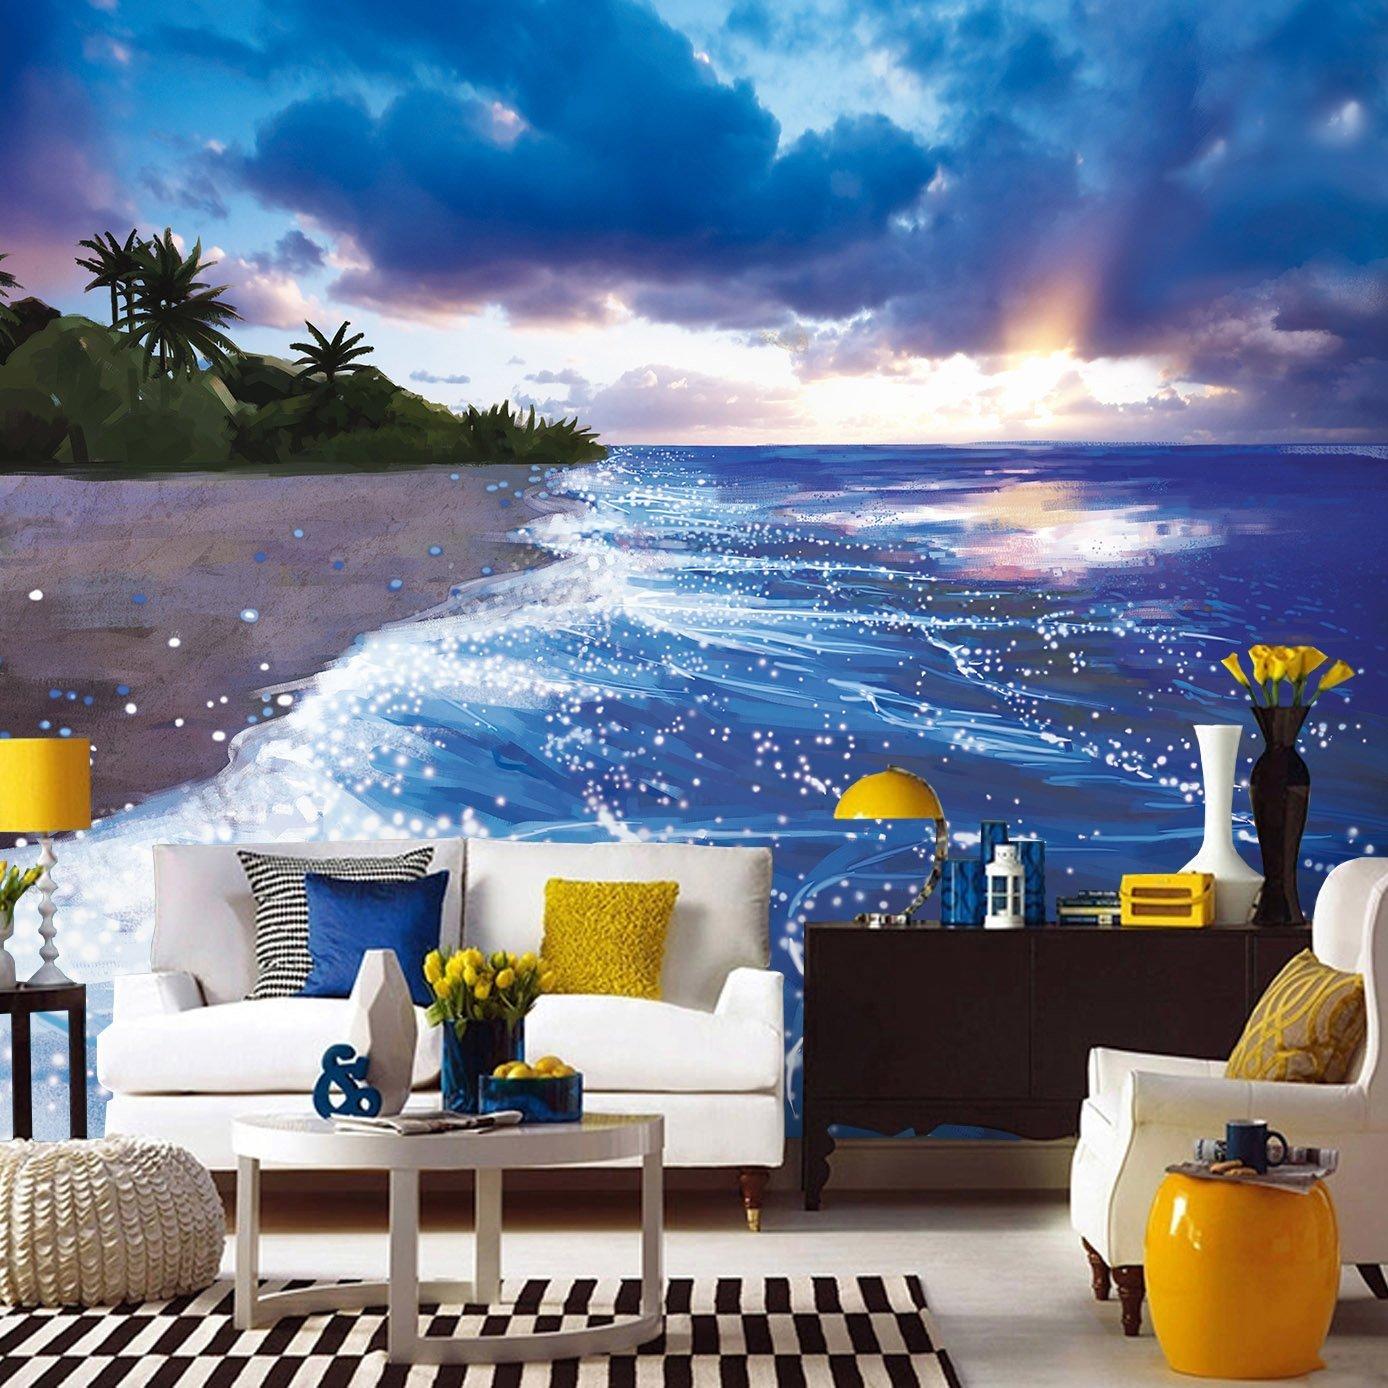 Painting Supplies, Tools & Wall Treatments Hd Print - Landscape Paintings Canvas Prints Nature Art - HD Wallpaper